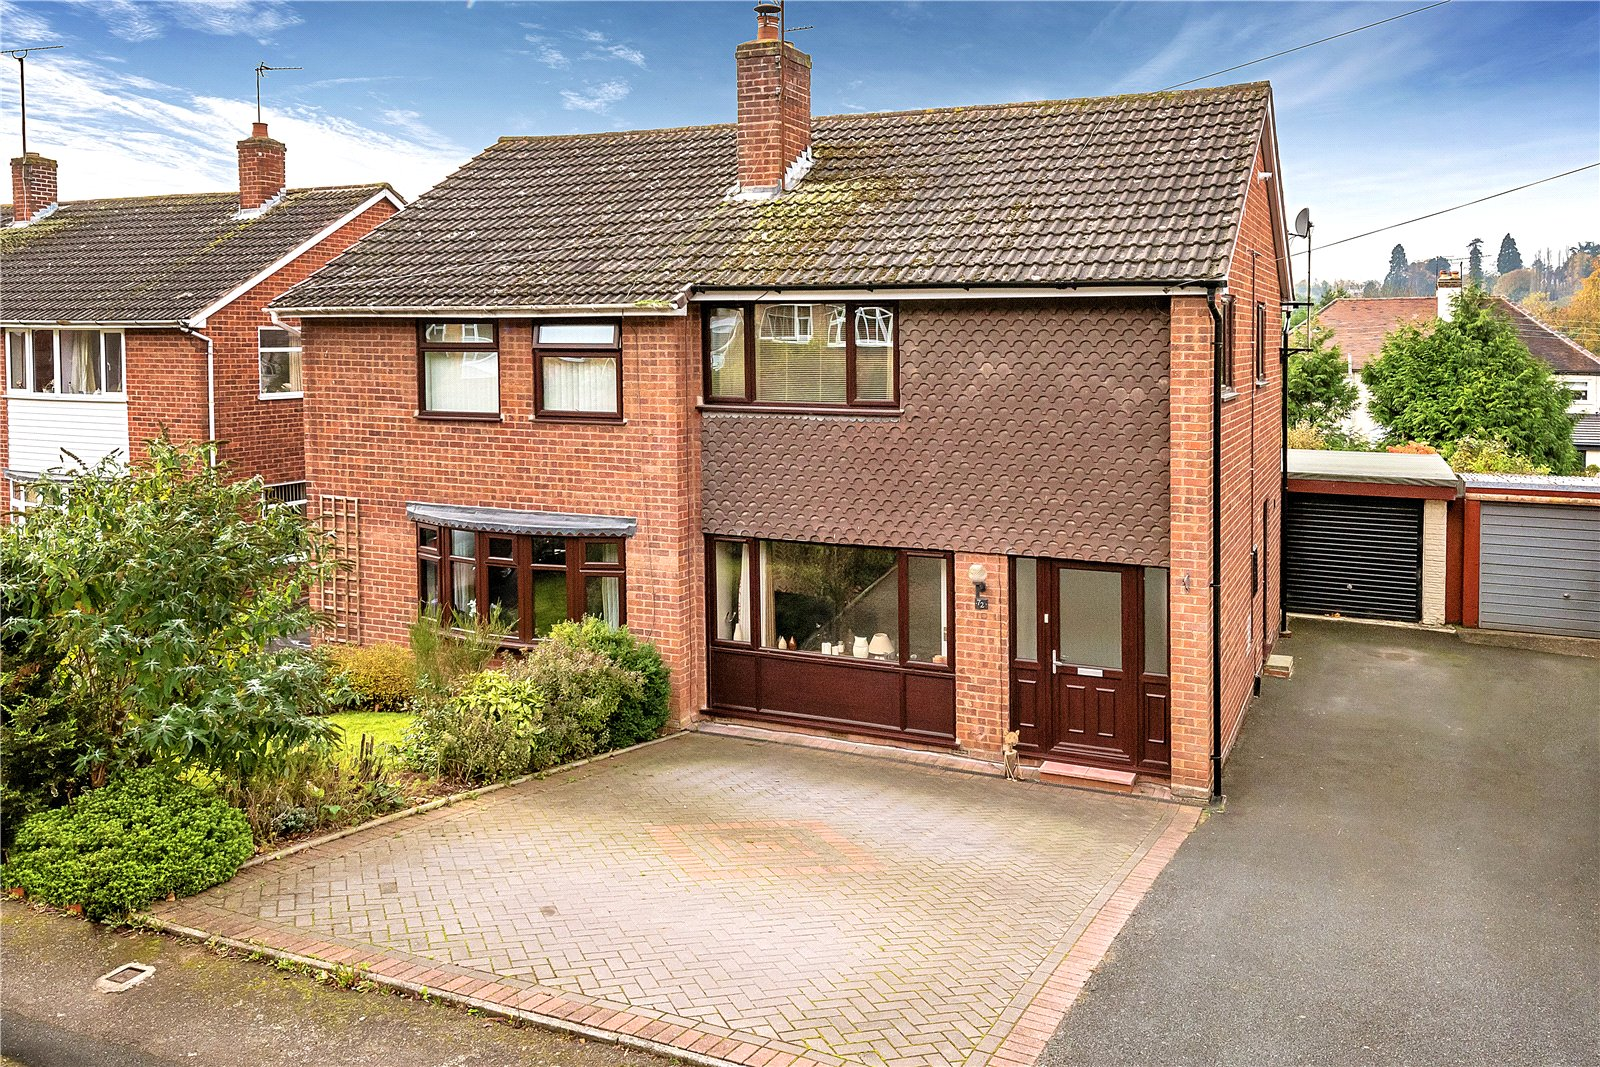 3 Bedrooms Semi Detached House for sale in 72 Hillside Avenue, Bridgnorth, Shropshire, WV15